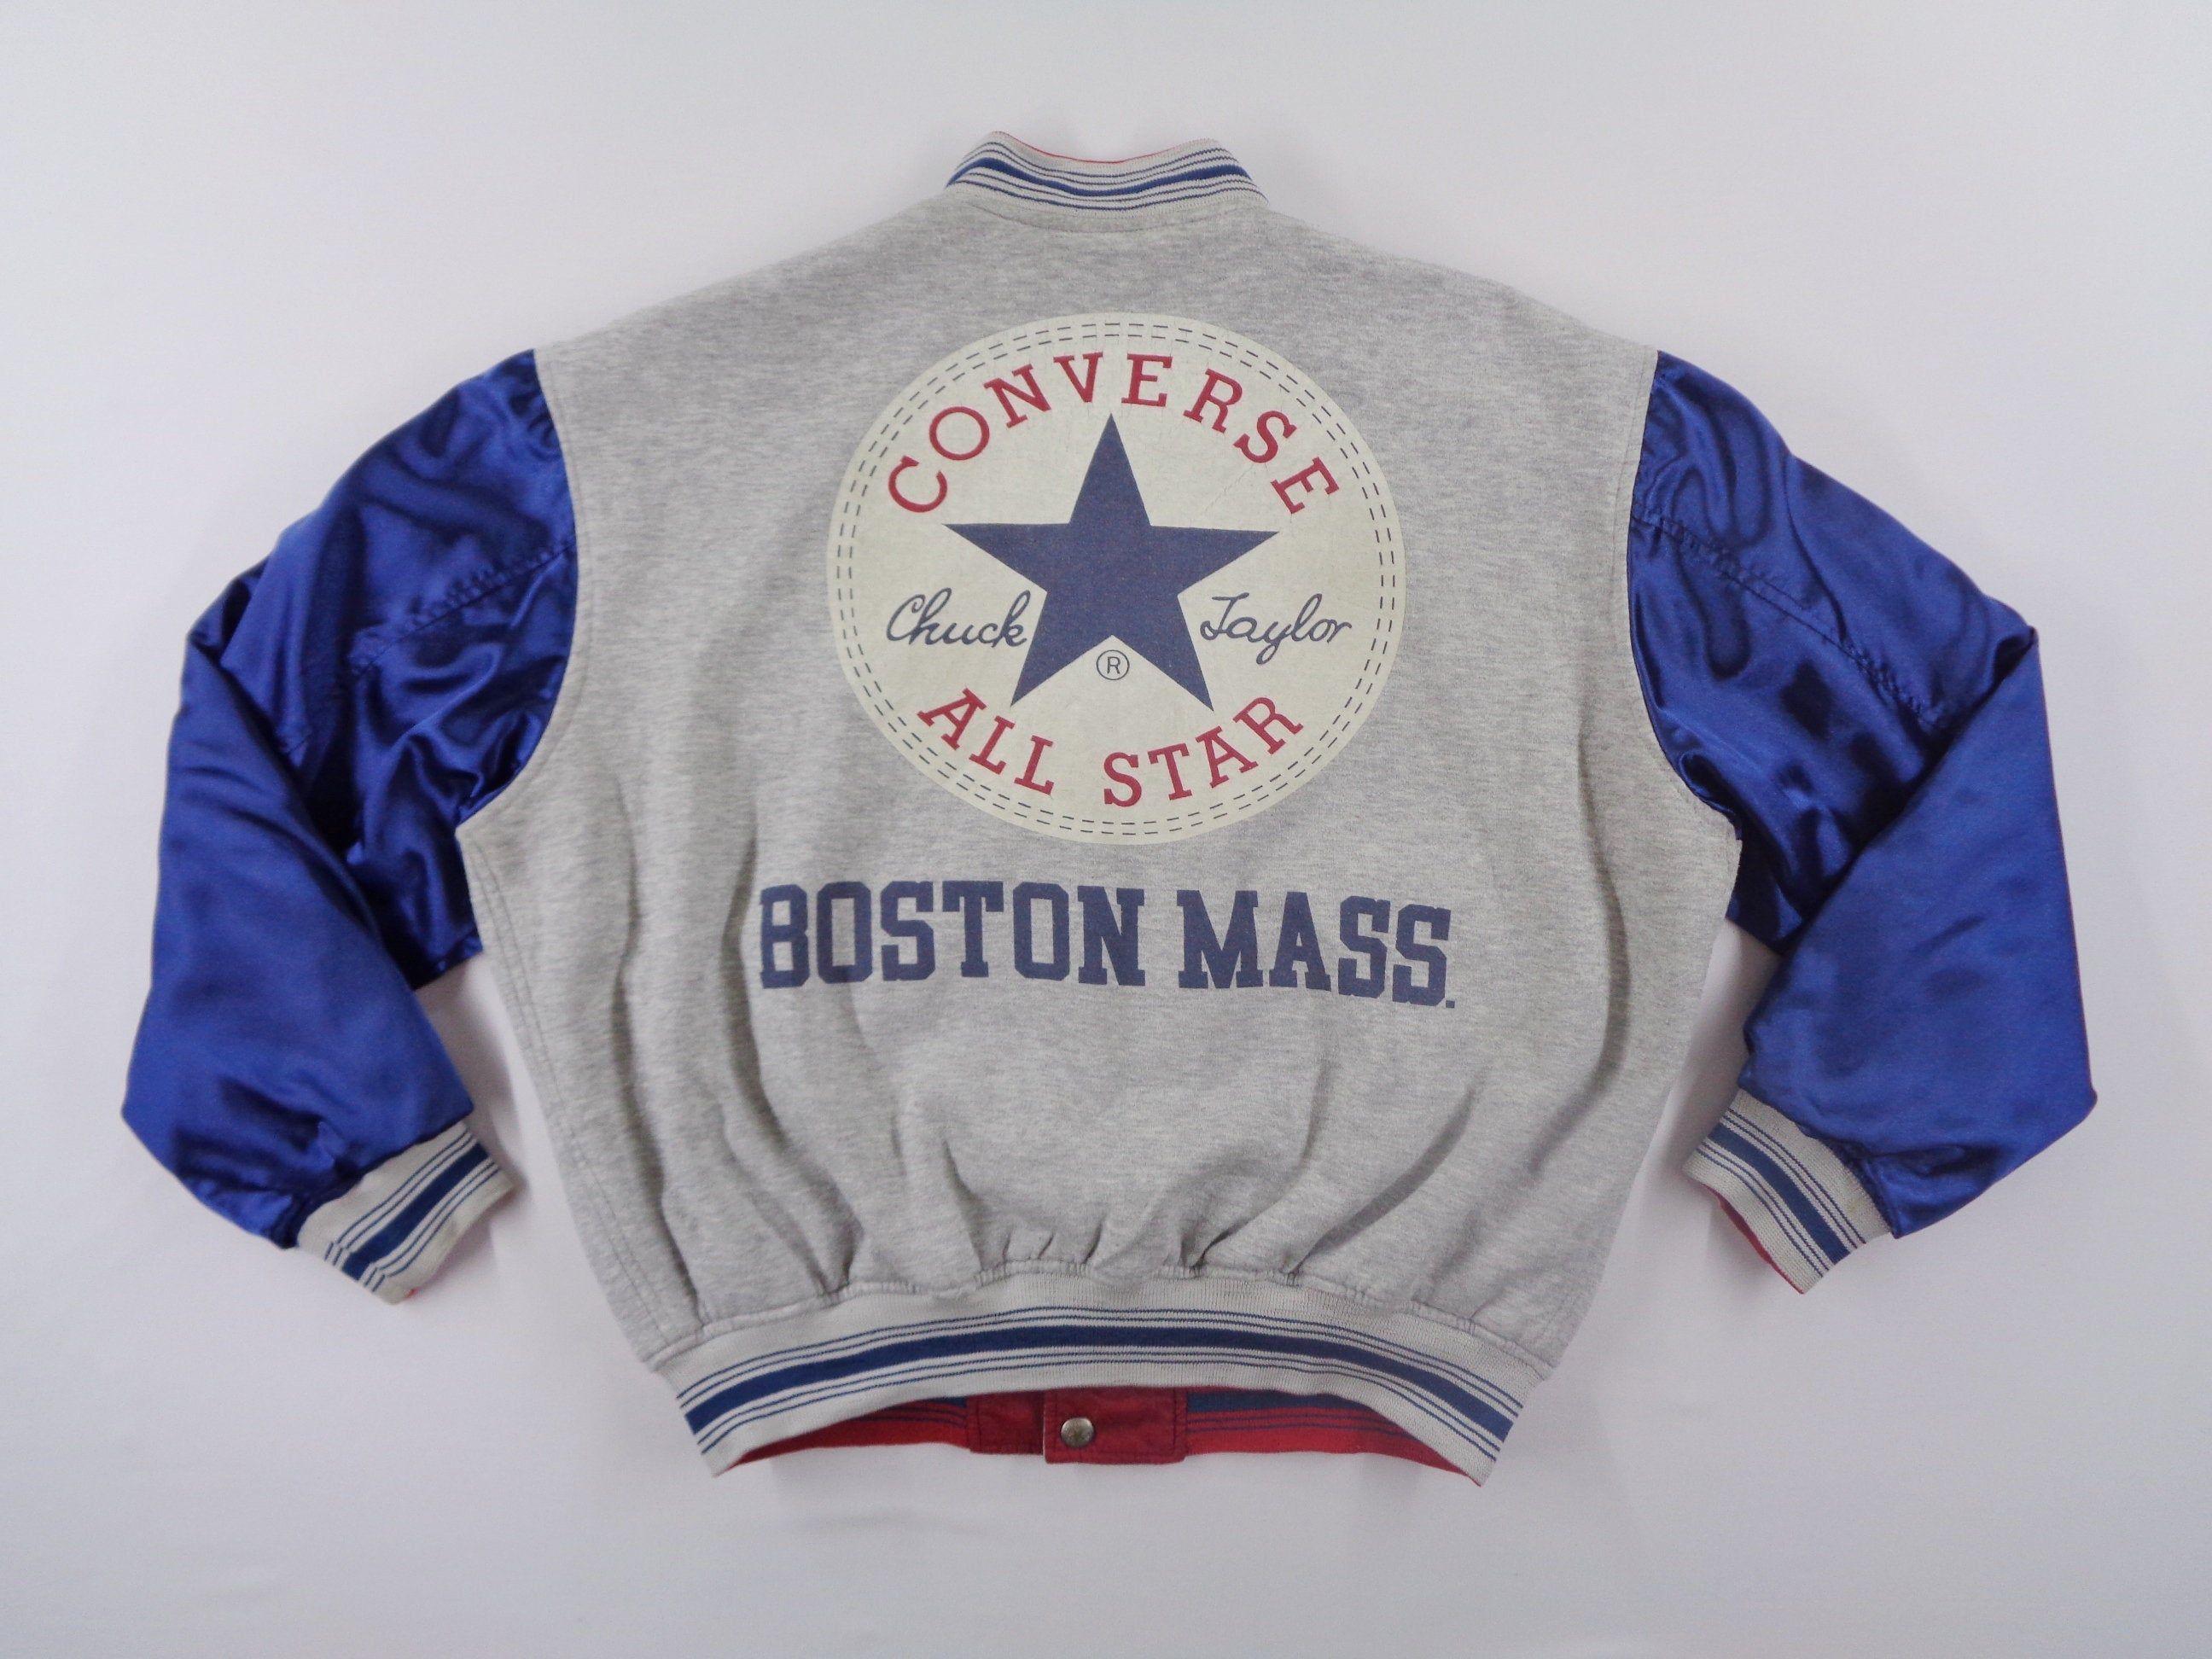 Converse Jacket Vintage Converse All Star Windbreaker Converse All Star Chuck Taylor Boston Mass Big Logo Bomber Jacket In 2020 Converse Jacket Vintage Jacket Jackets